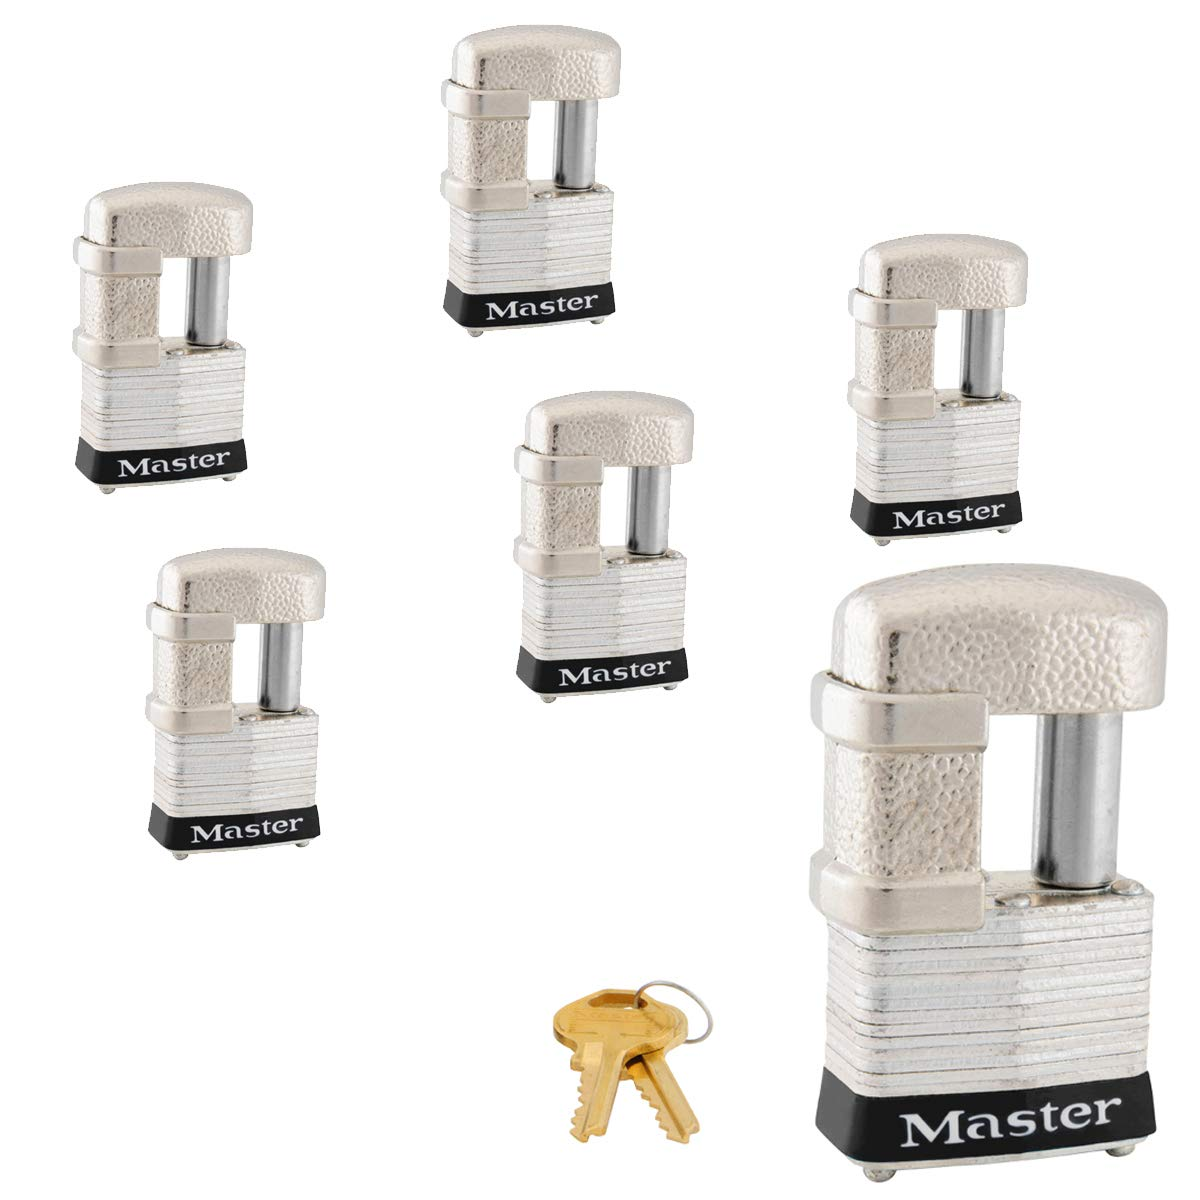 Master Lock - (6) Keyed Alike Trailer & Multi Purpose Padlocks, 37KA-6 by Master Lock